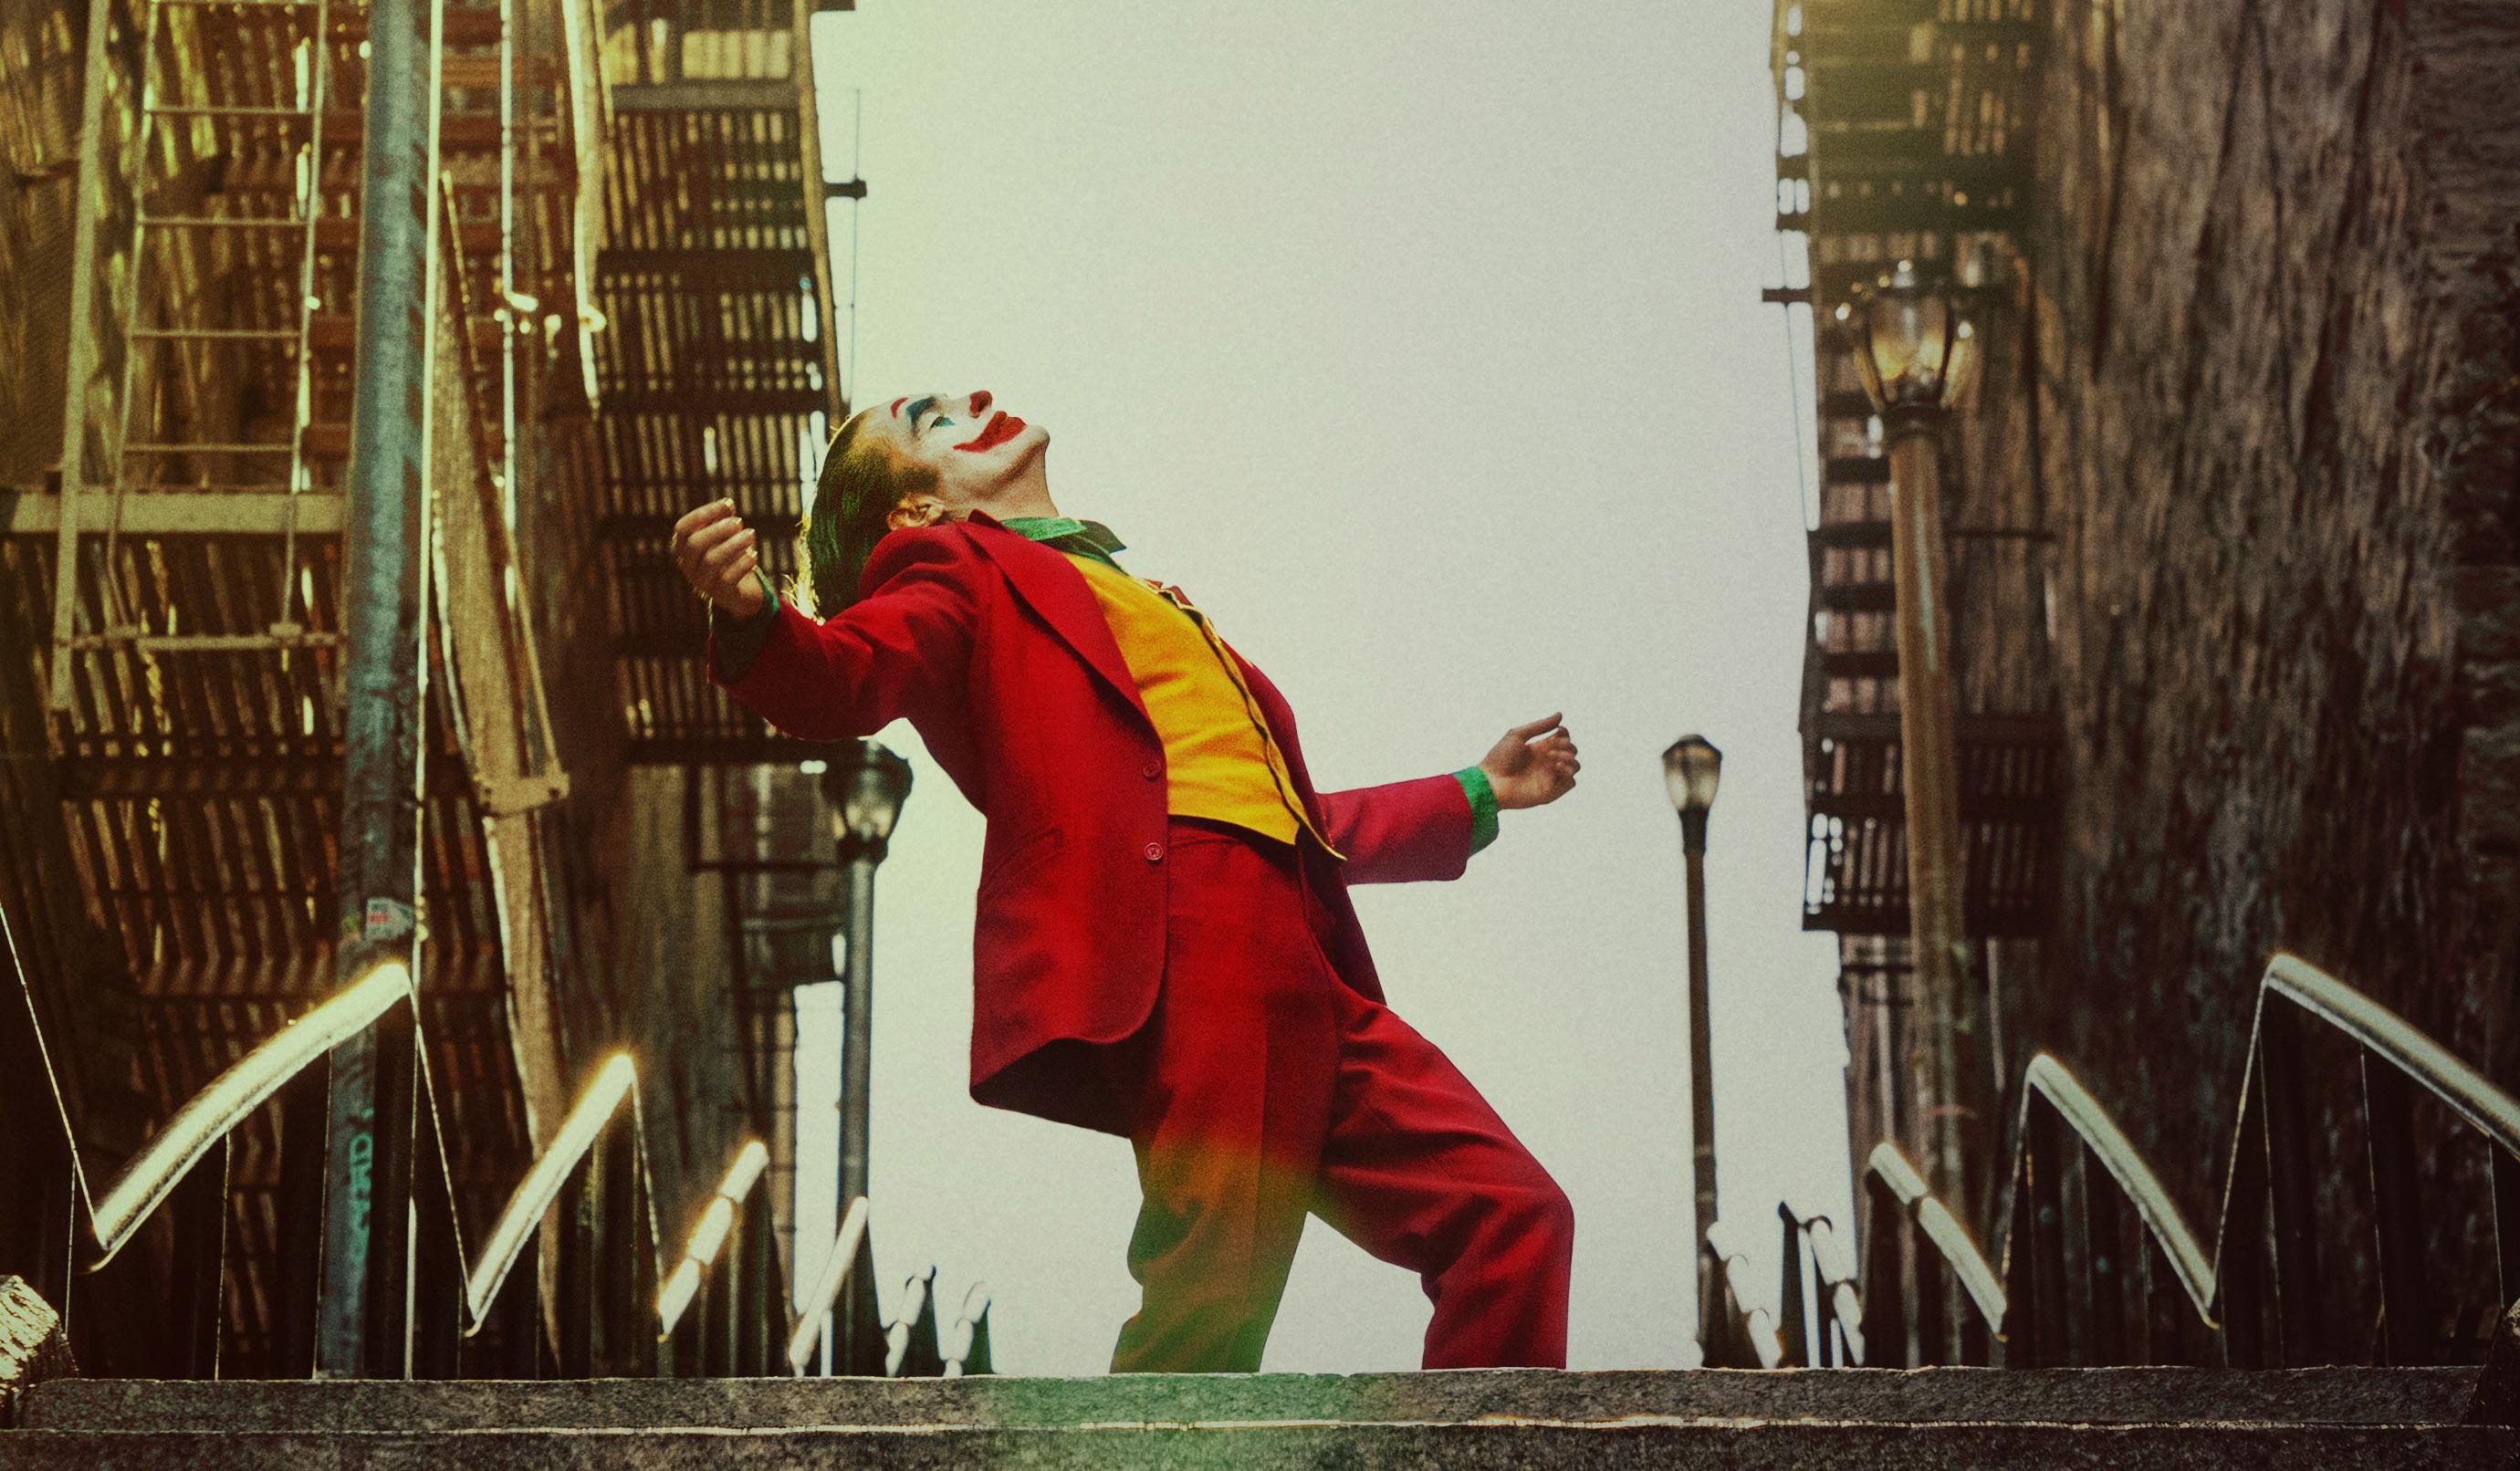 Joaquin Phoenix dancing on the now famous Joker stairs